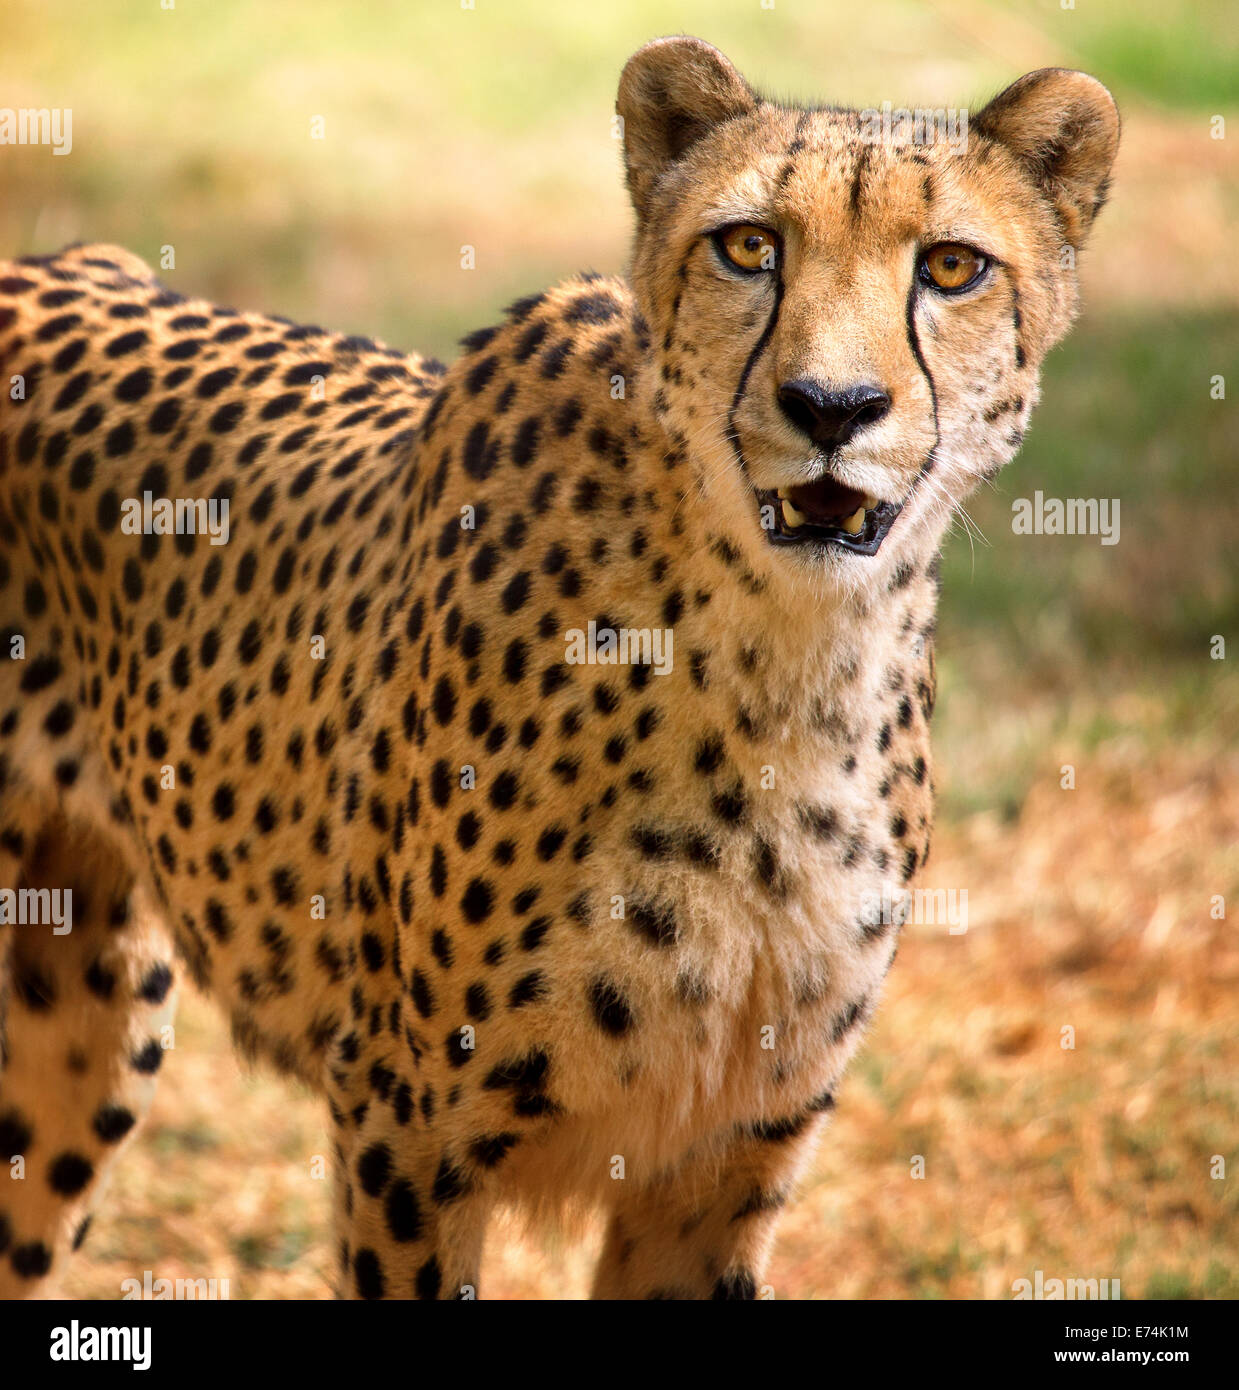 CheetahStock Photo